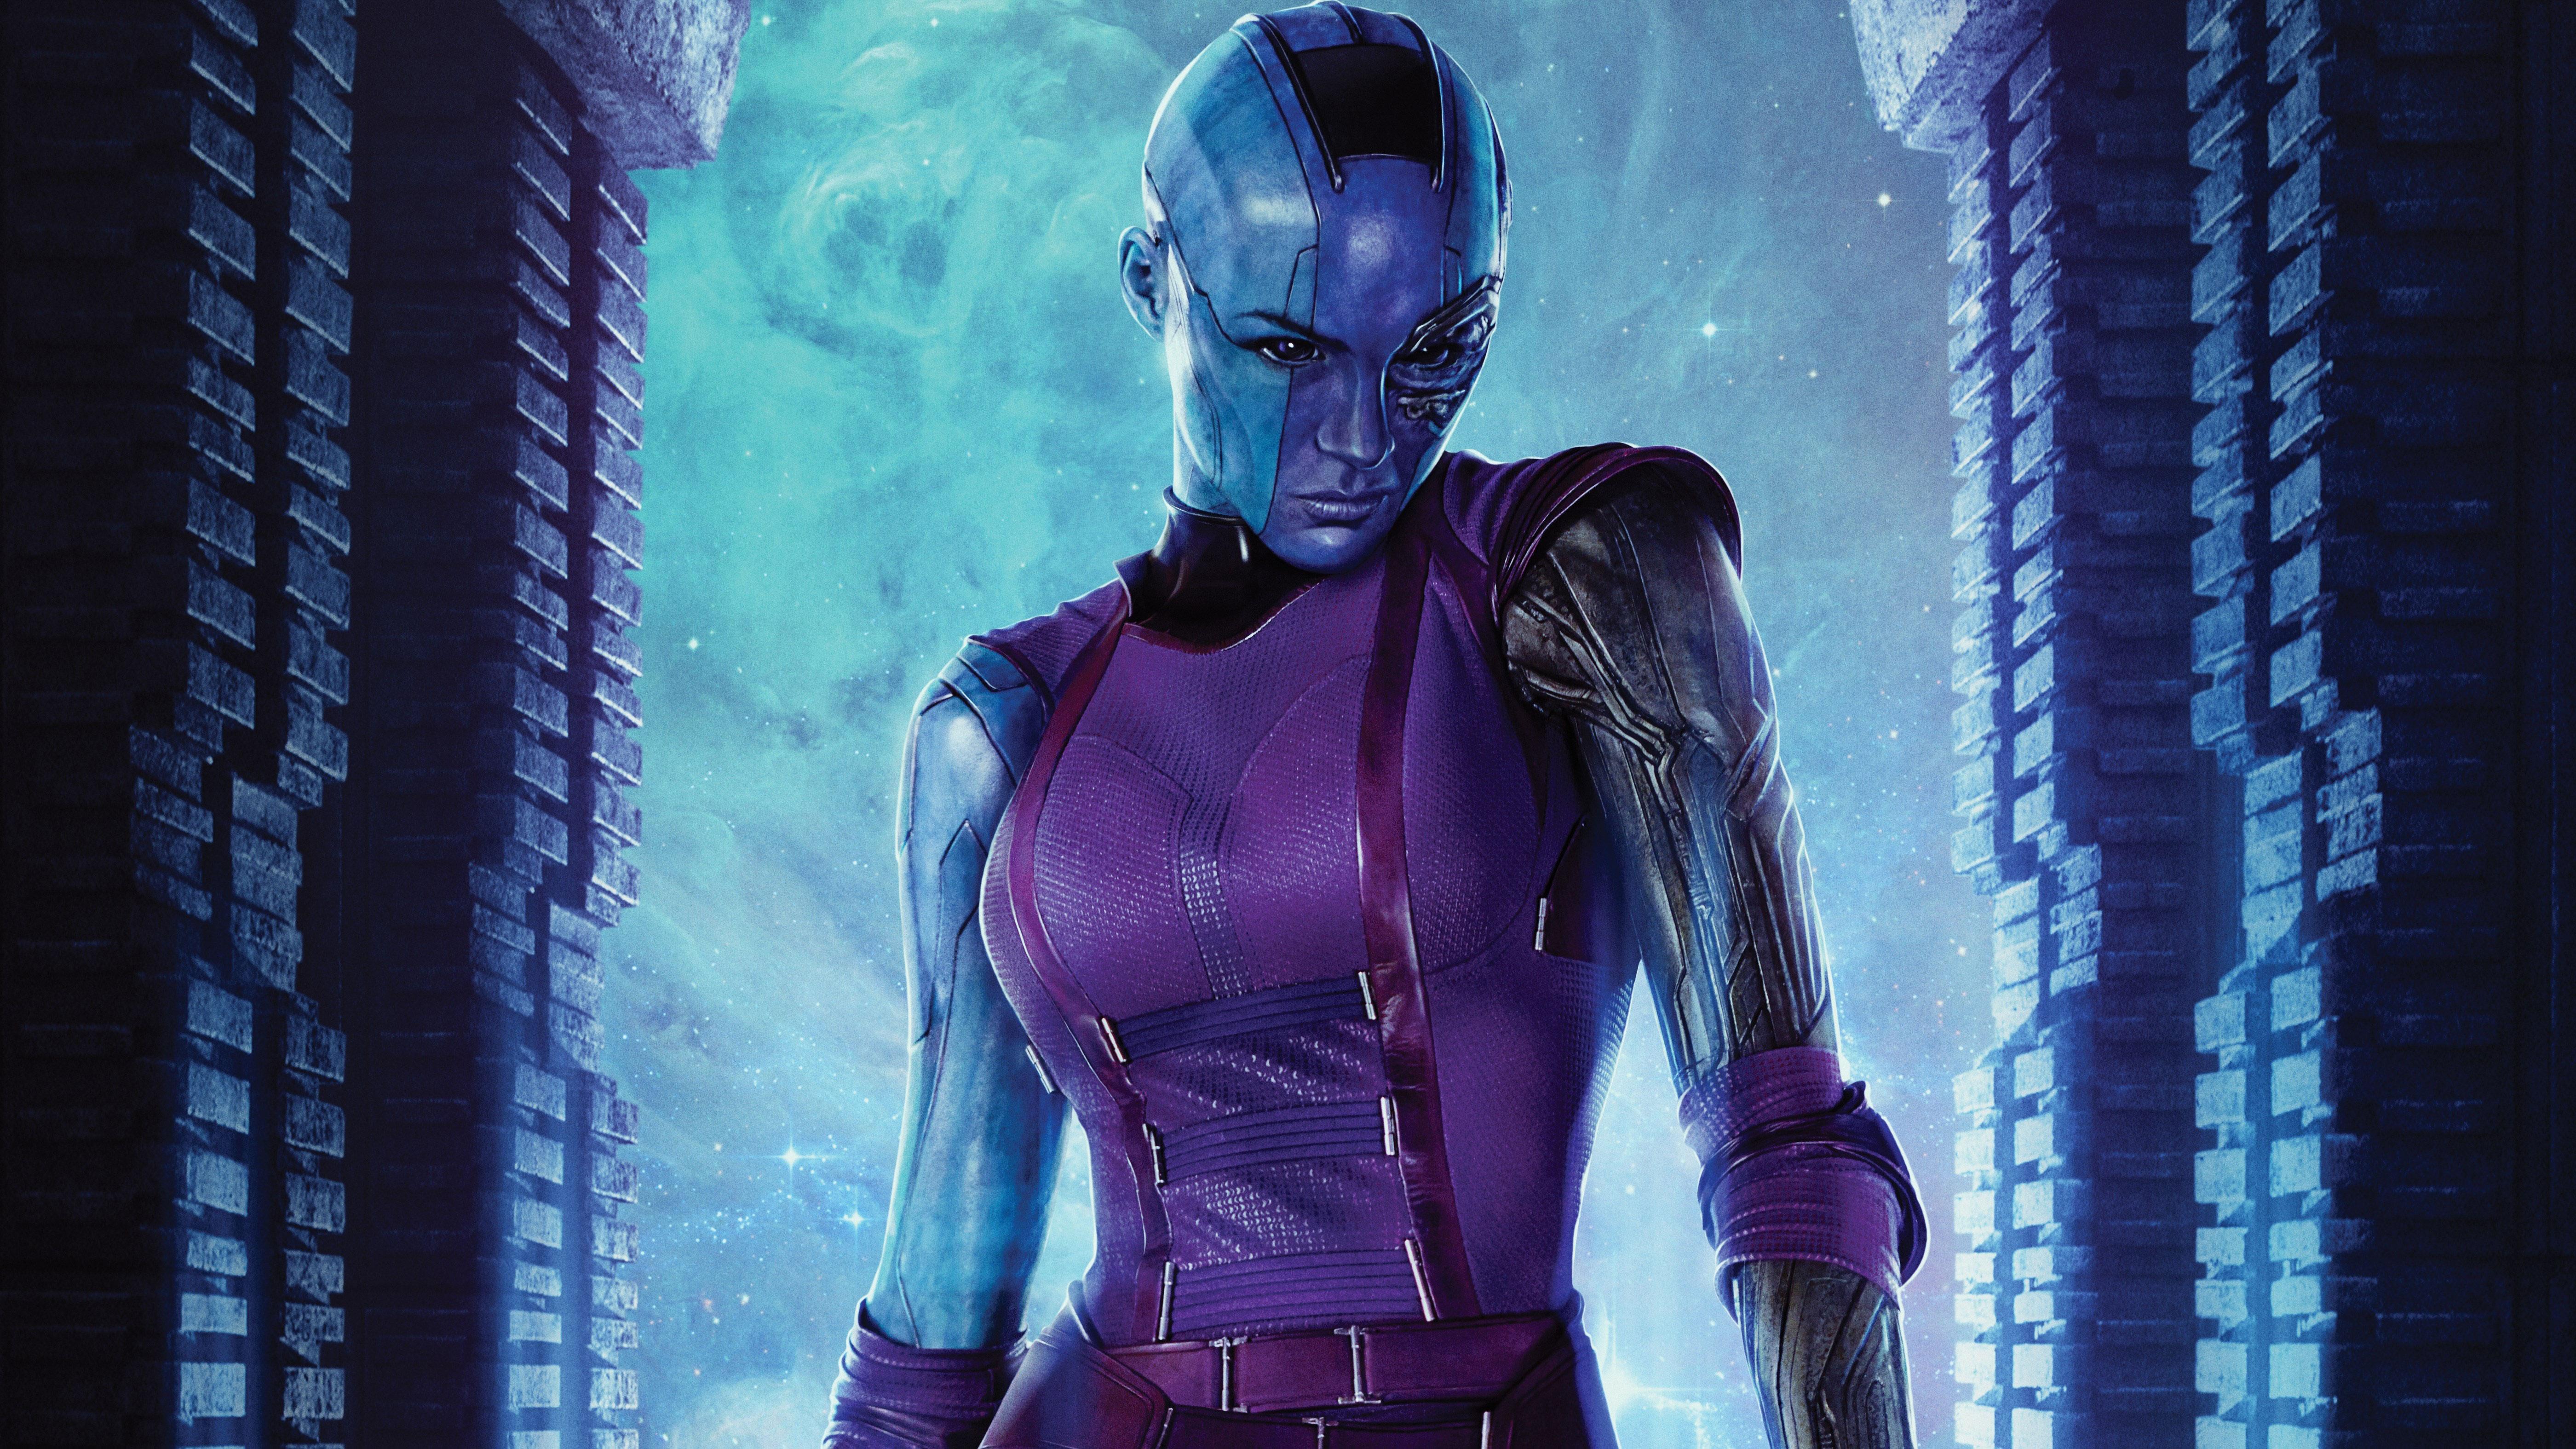 Nebula Guardians Of The Galaxy Vol 2 HD 4K Wallpaper